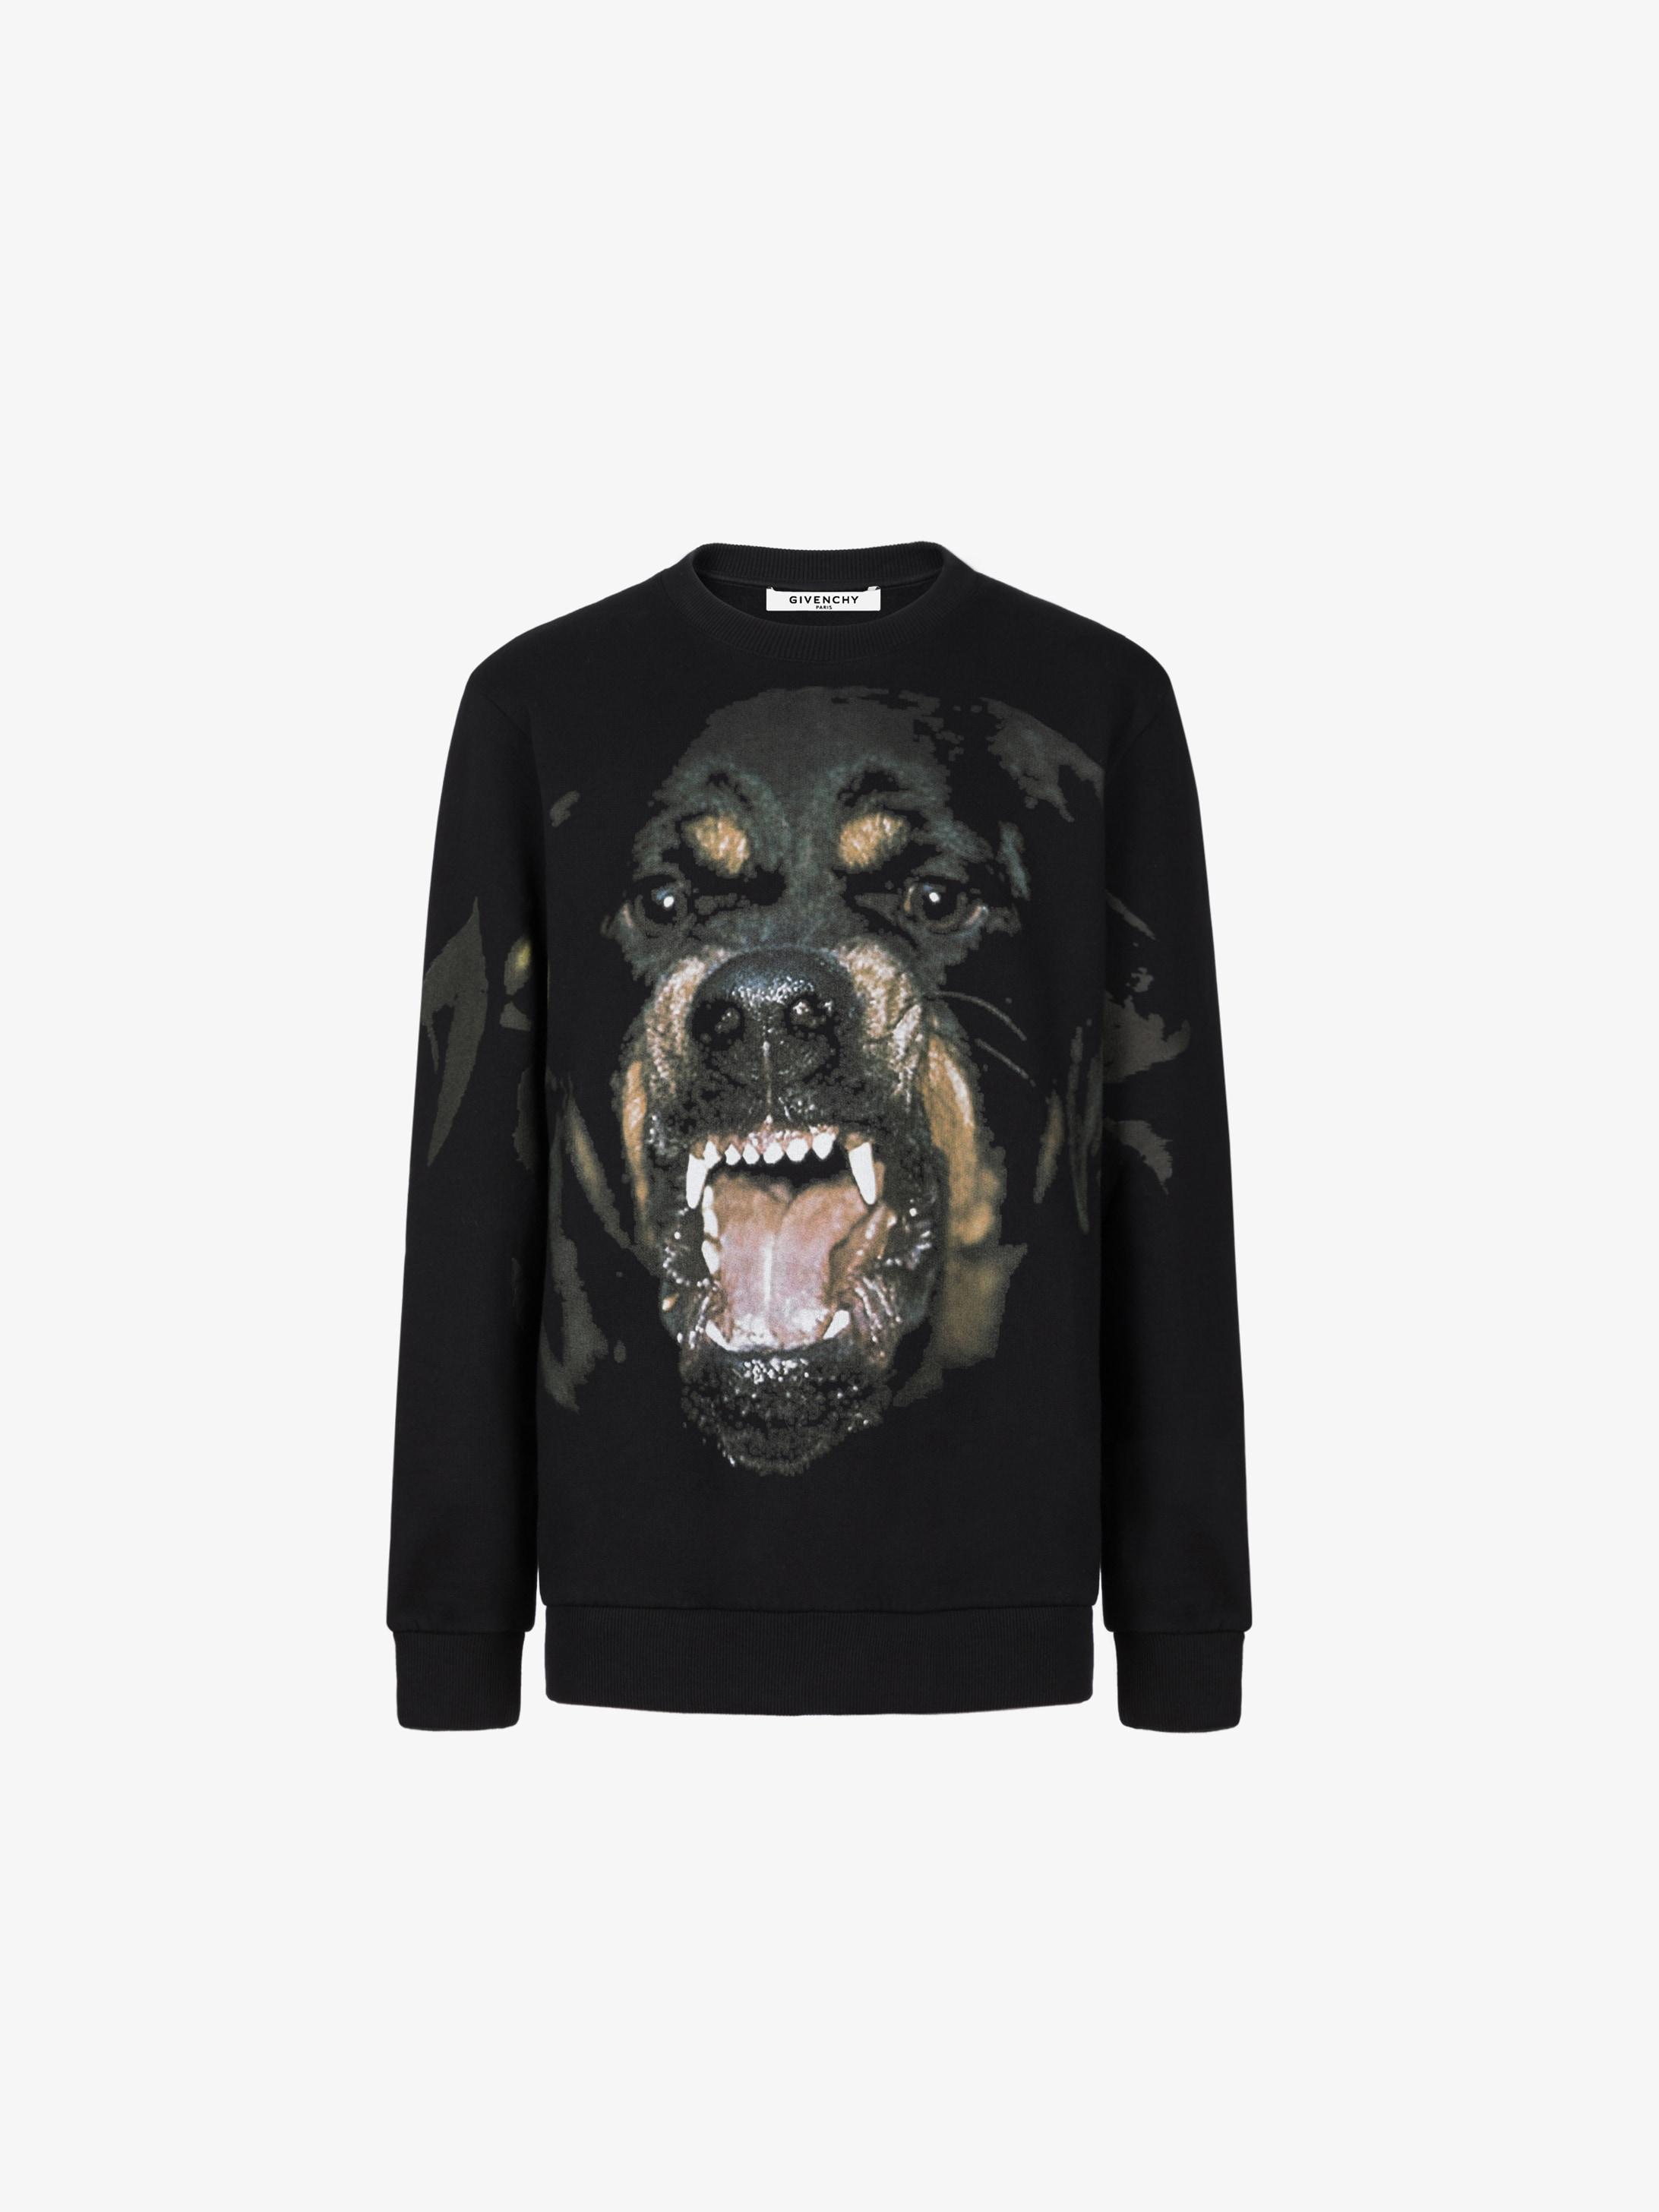 Givenchy Rottweiler printed sweatshirt  01c136cbe